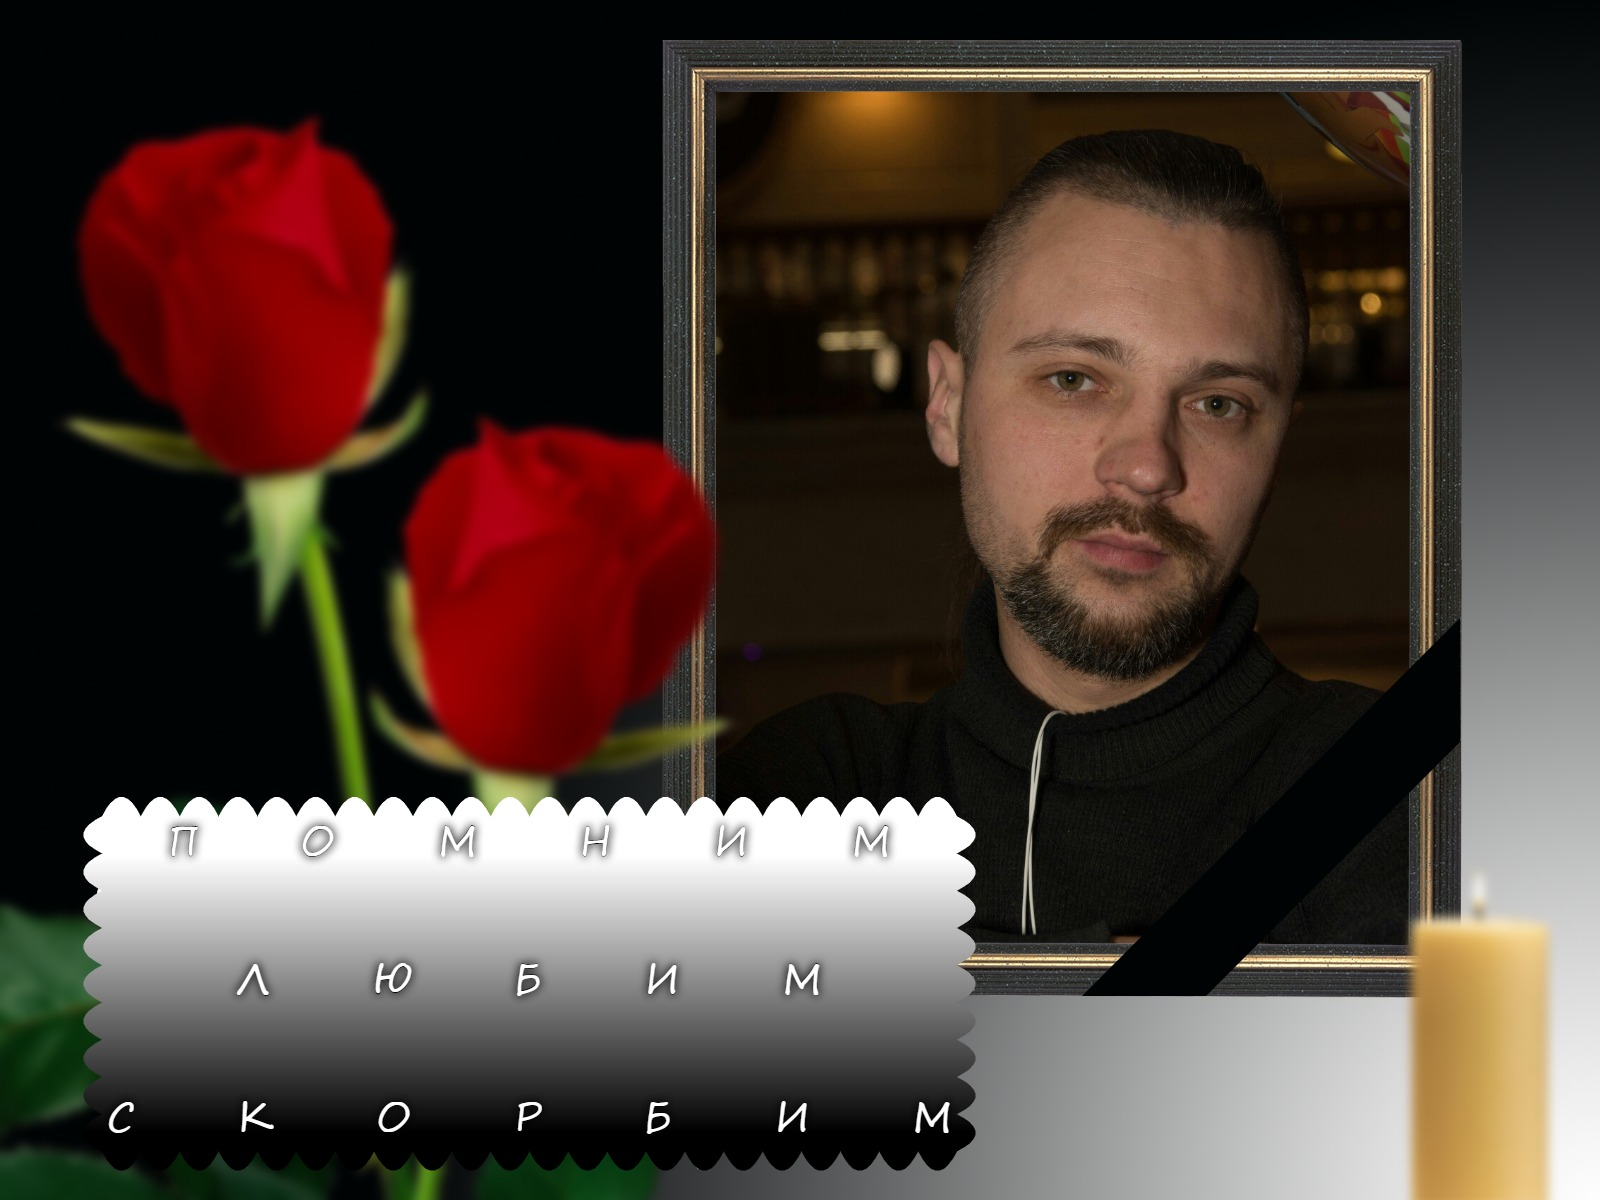 https://sun9-51.userapi.com/c857132/v857132851/18e1cc/y9KeLqg_VqE.jpg